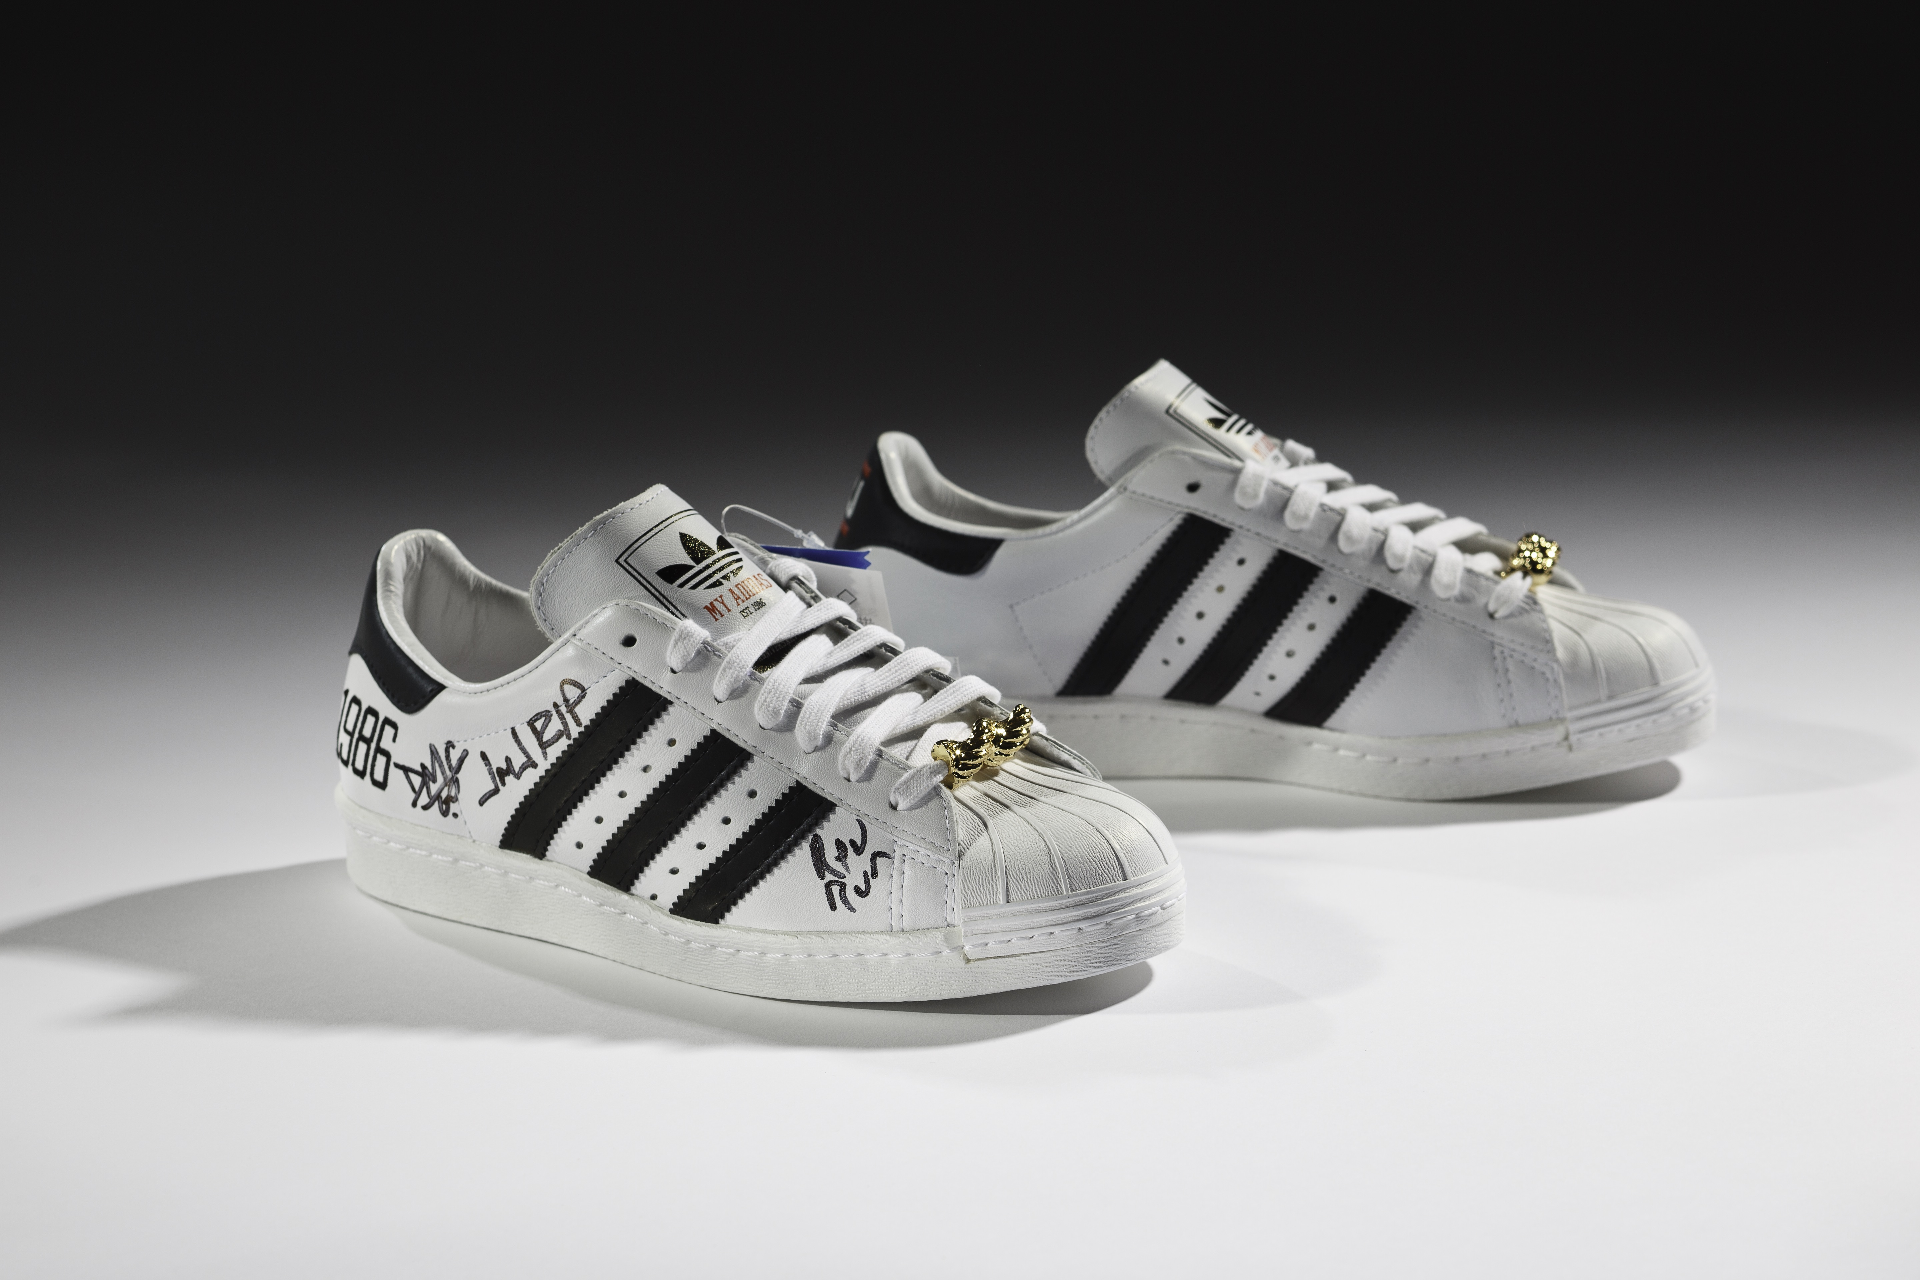 Online Alte Adidas acquista Adidas Prezzi Scarpe Bimba A 4L35ARj